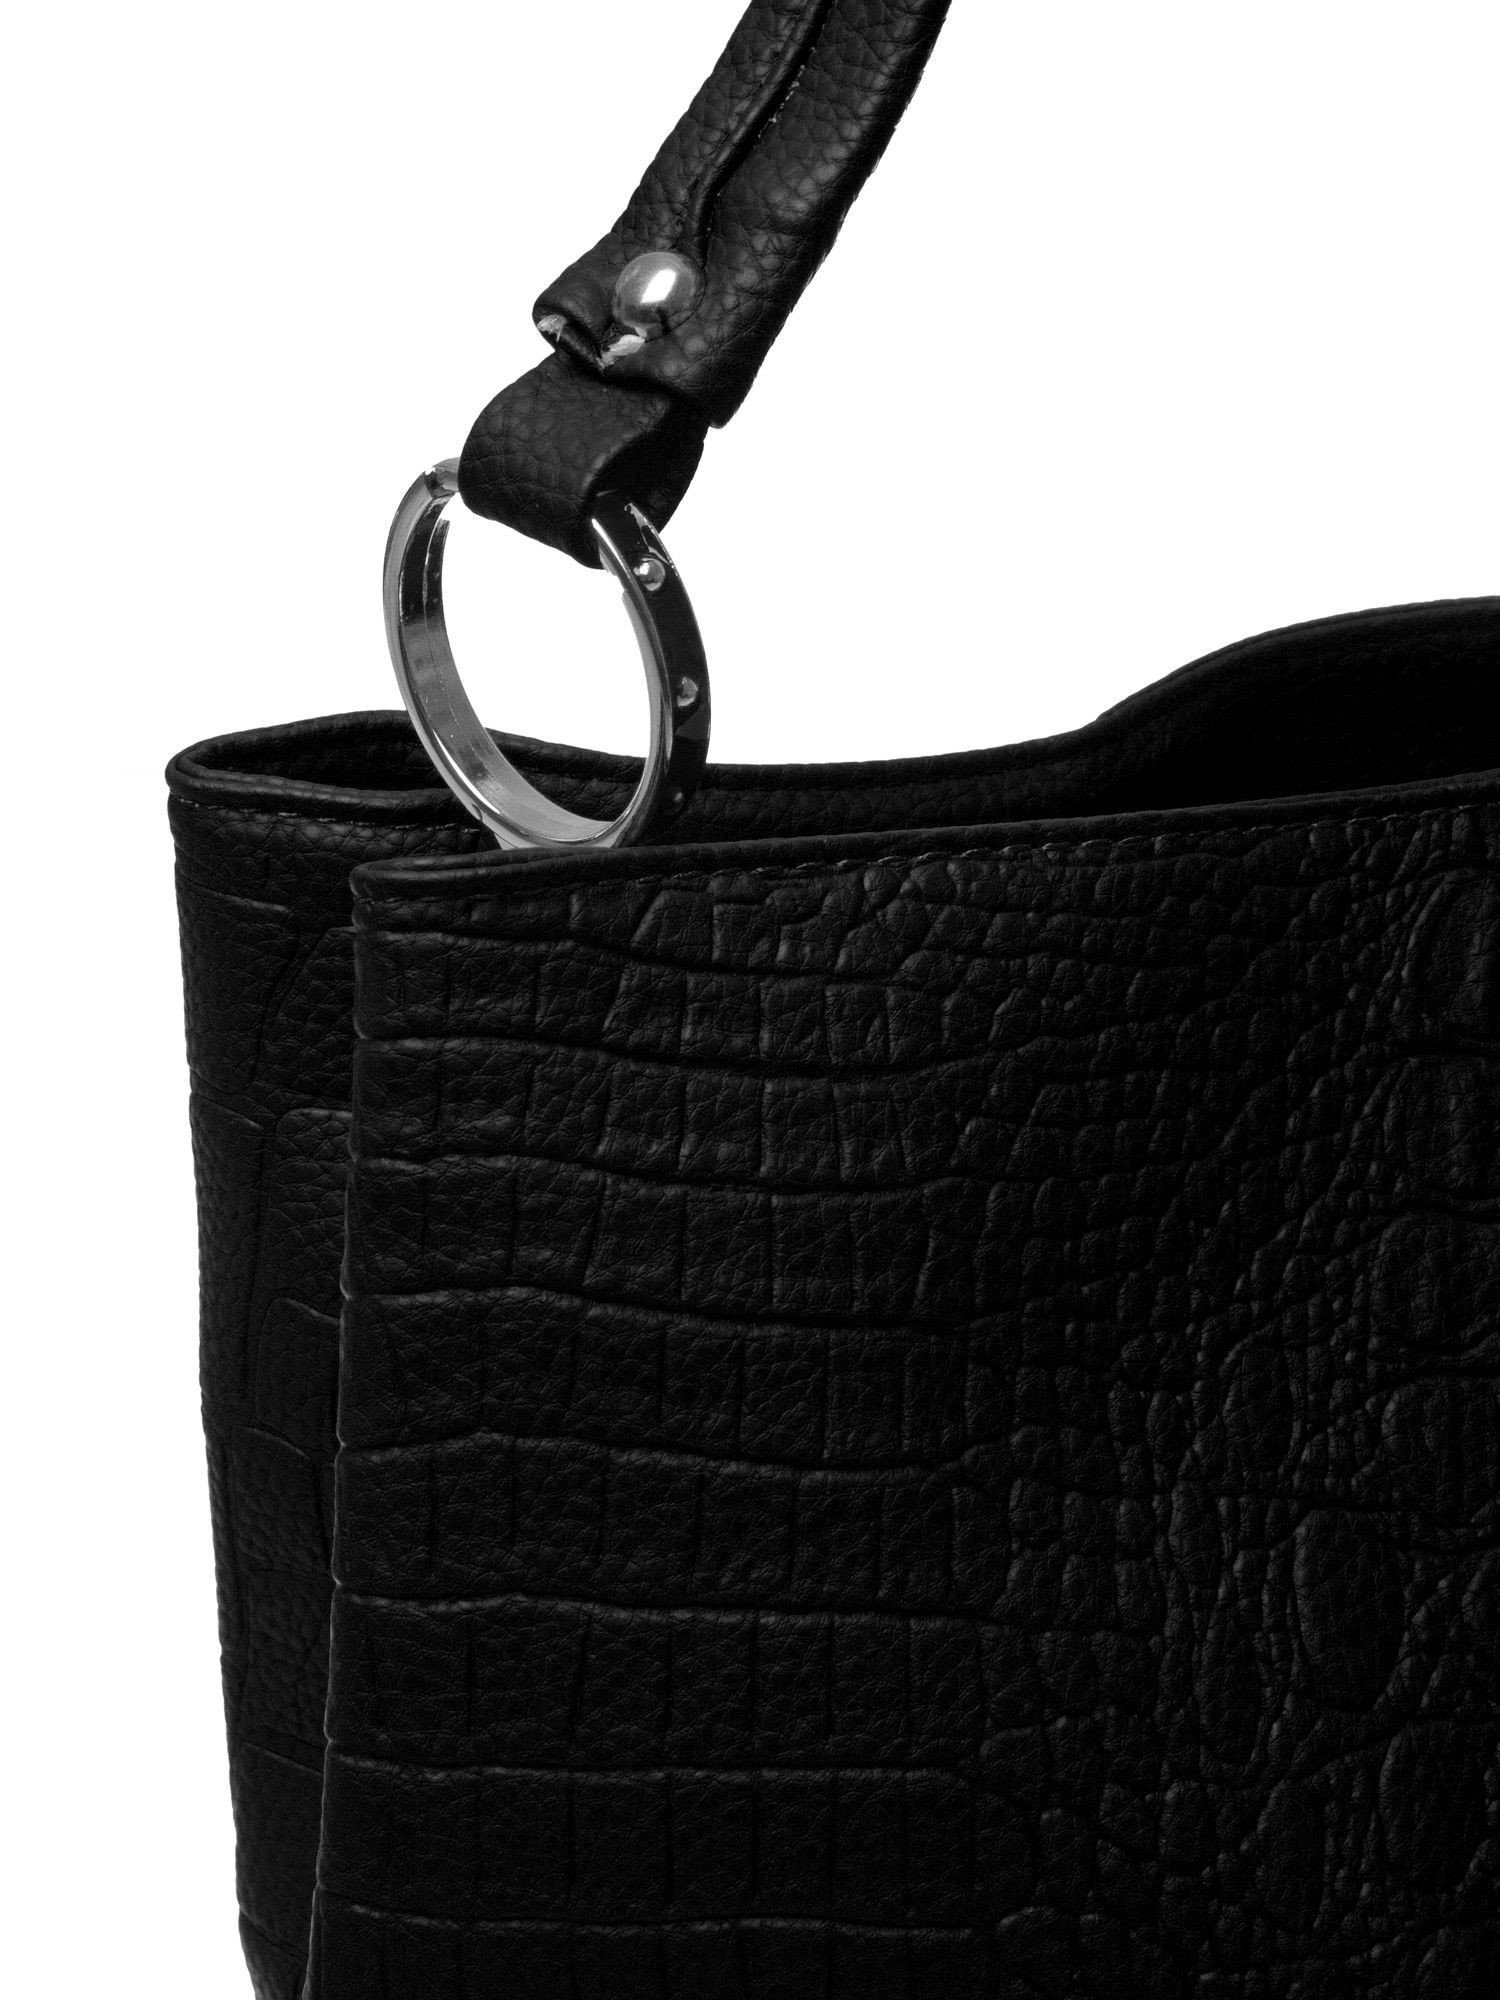 Czarna torebka na ramię tłoczona na wzór skóry krokodyla                                  zdj.                                  4